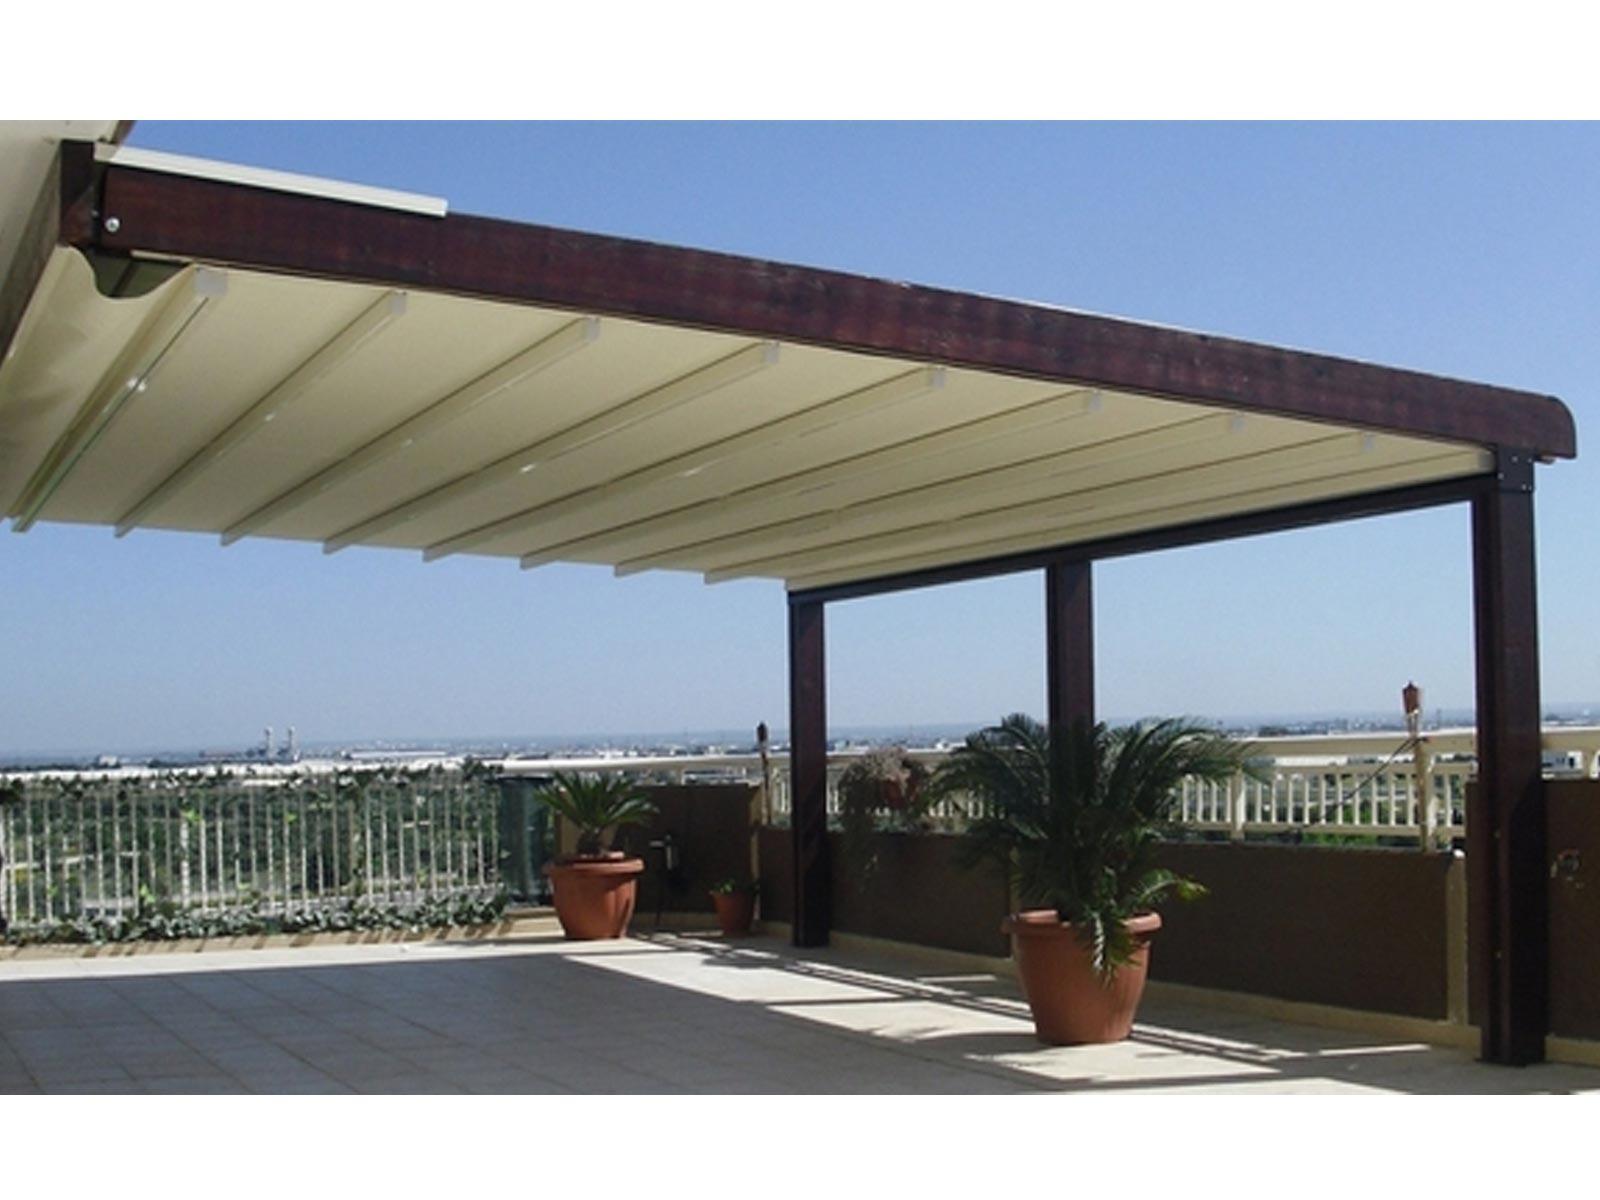 Copertura in pvc per terrazzo a brescia e bergamo essevi - Soluzioni per copertura terrazzi ...